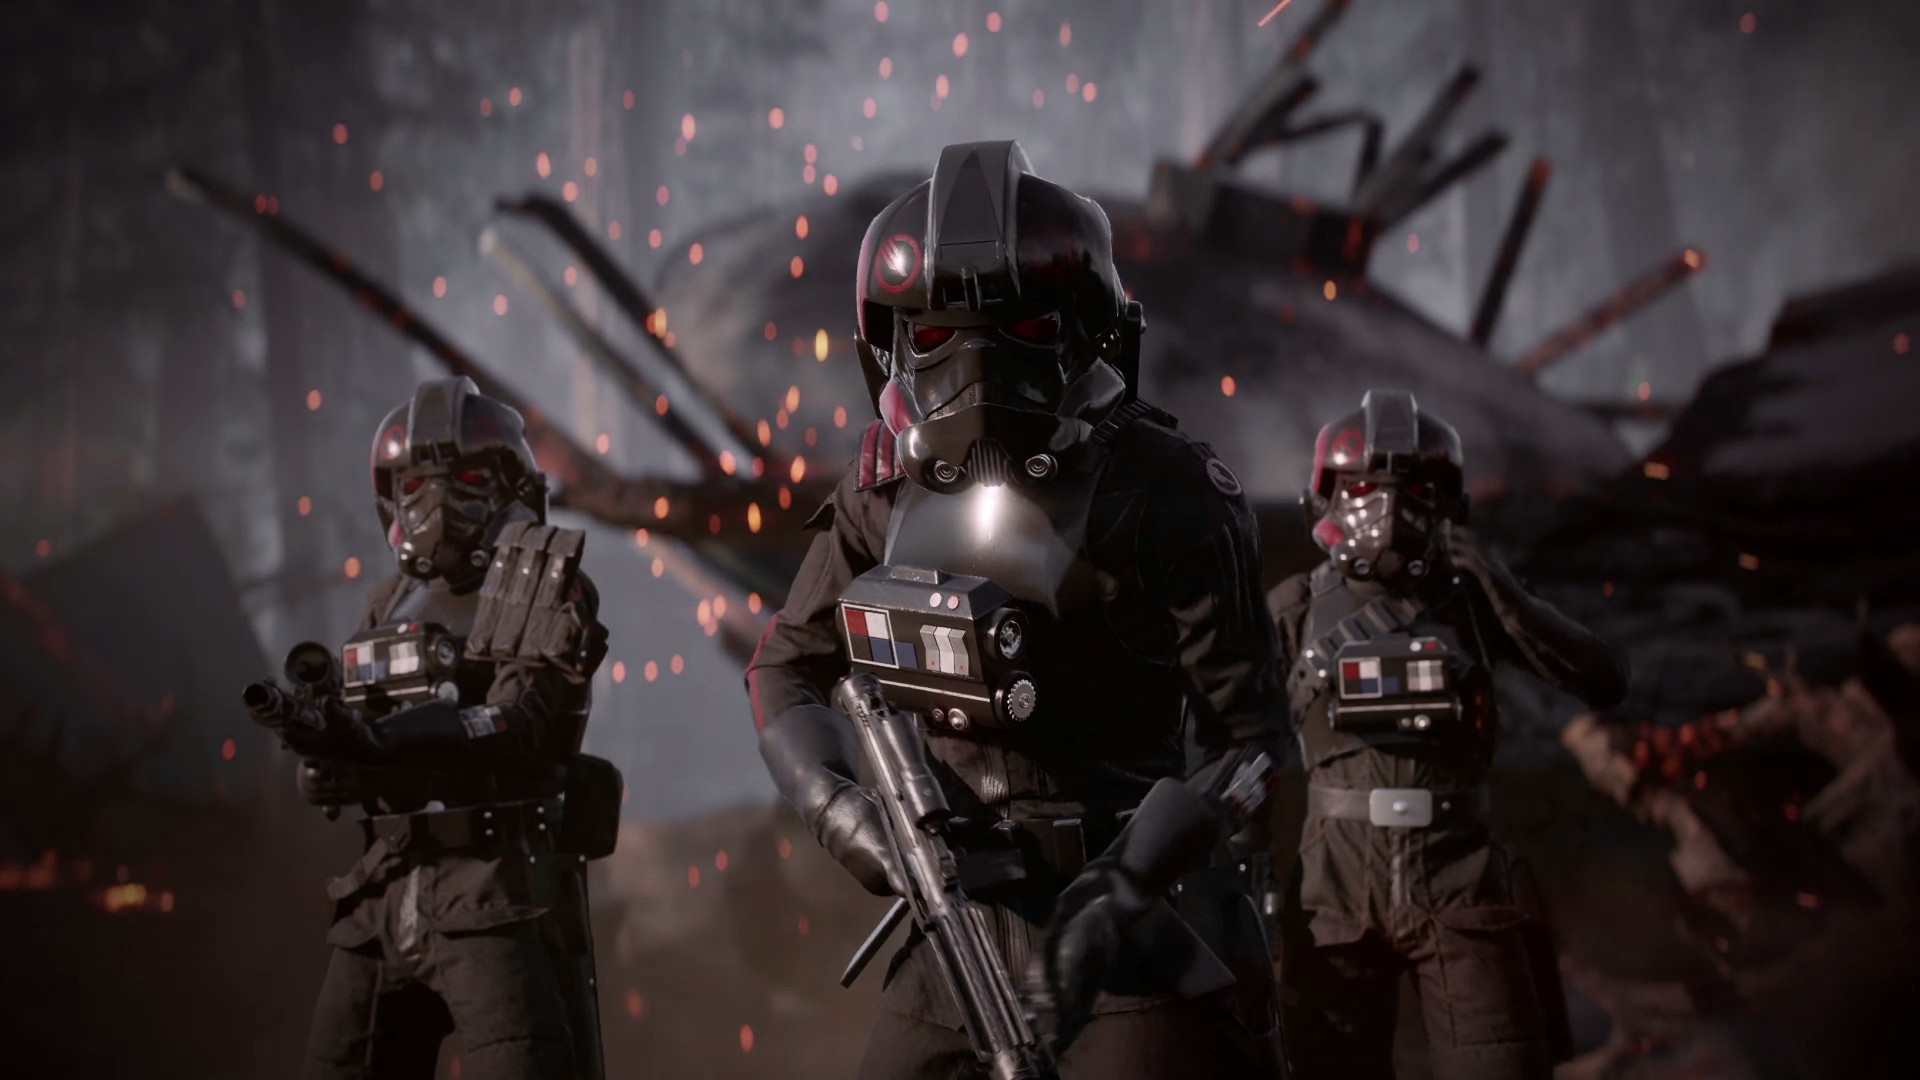 Star Wars Battlefront 2 Hd Wallpaper Posted By John Mercado